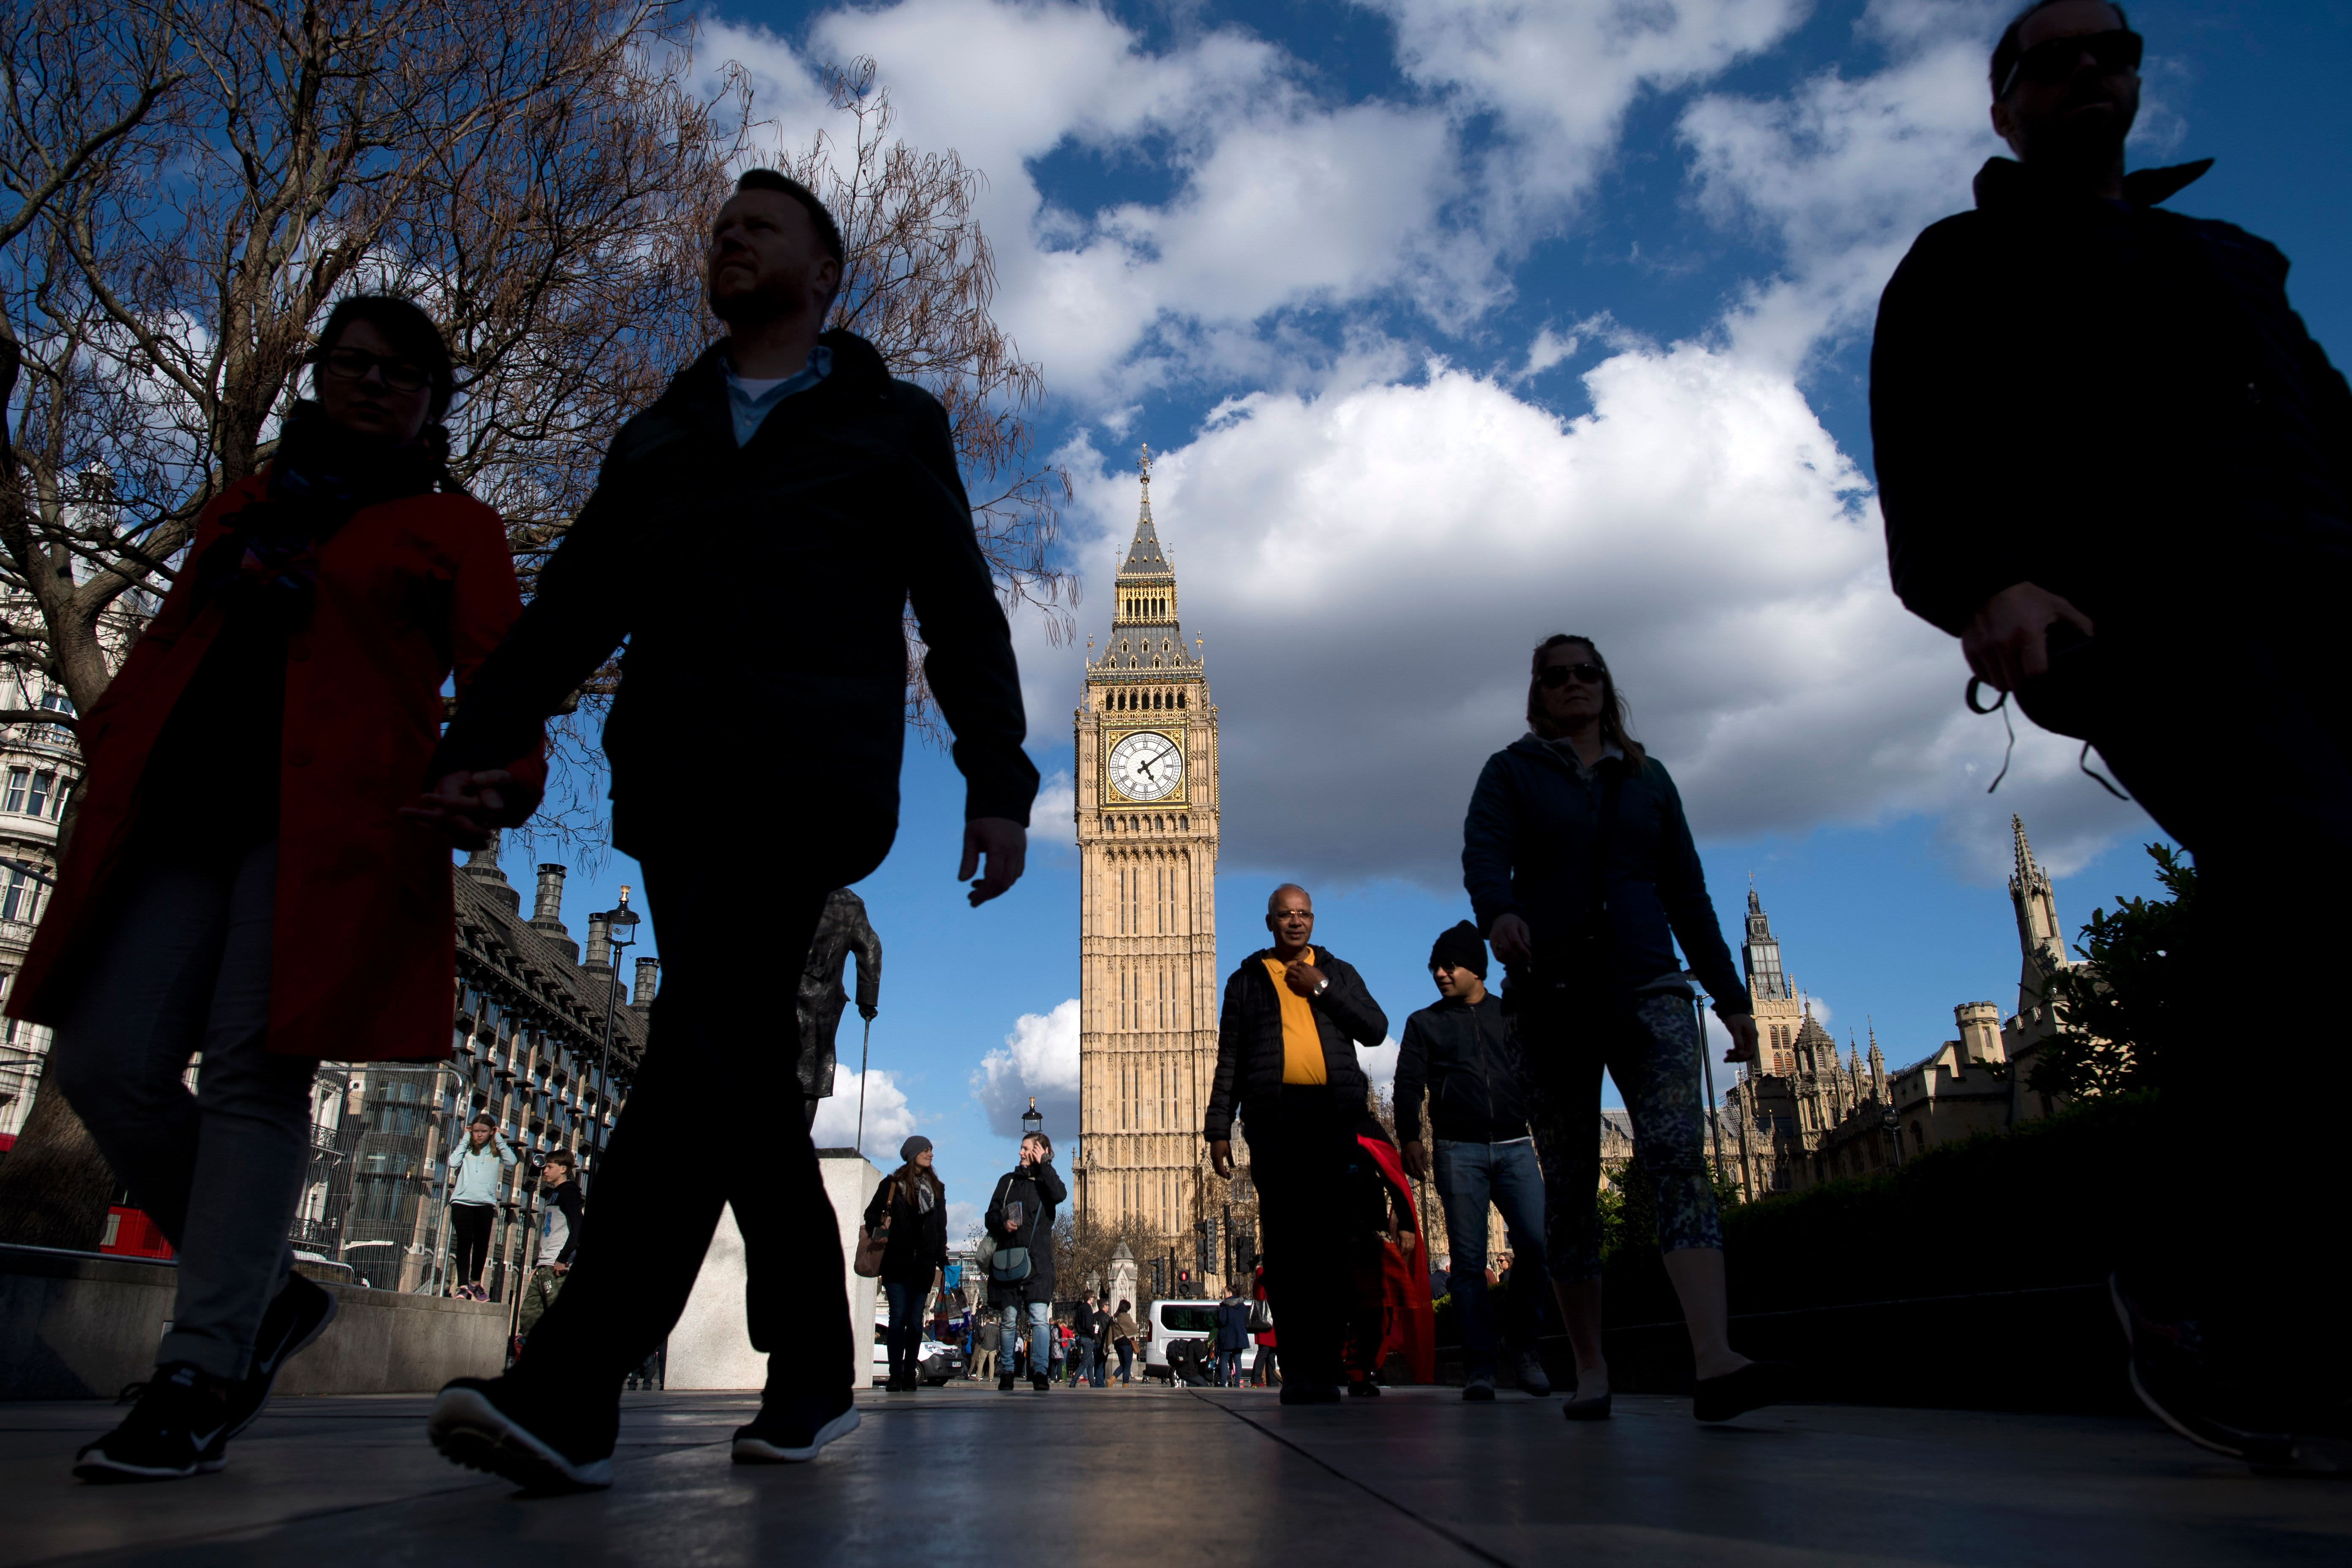 Rebel lawmakers apply for emergency debate in UK parliament in a bid to thwart no-deal Brexit